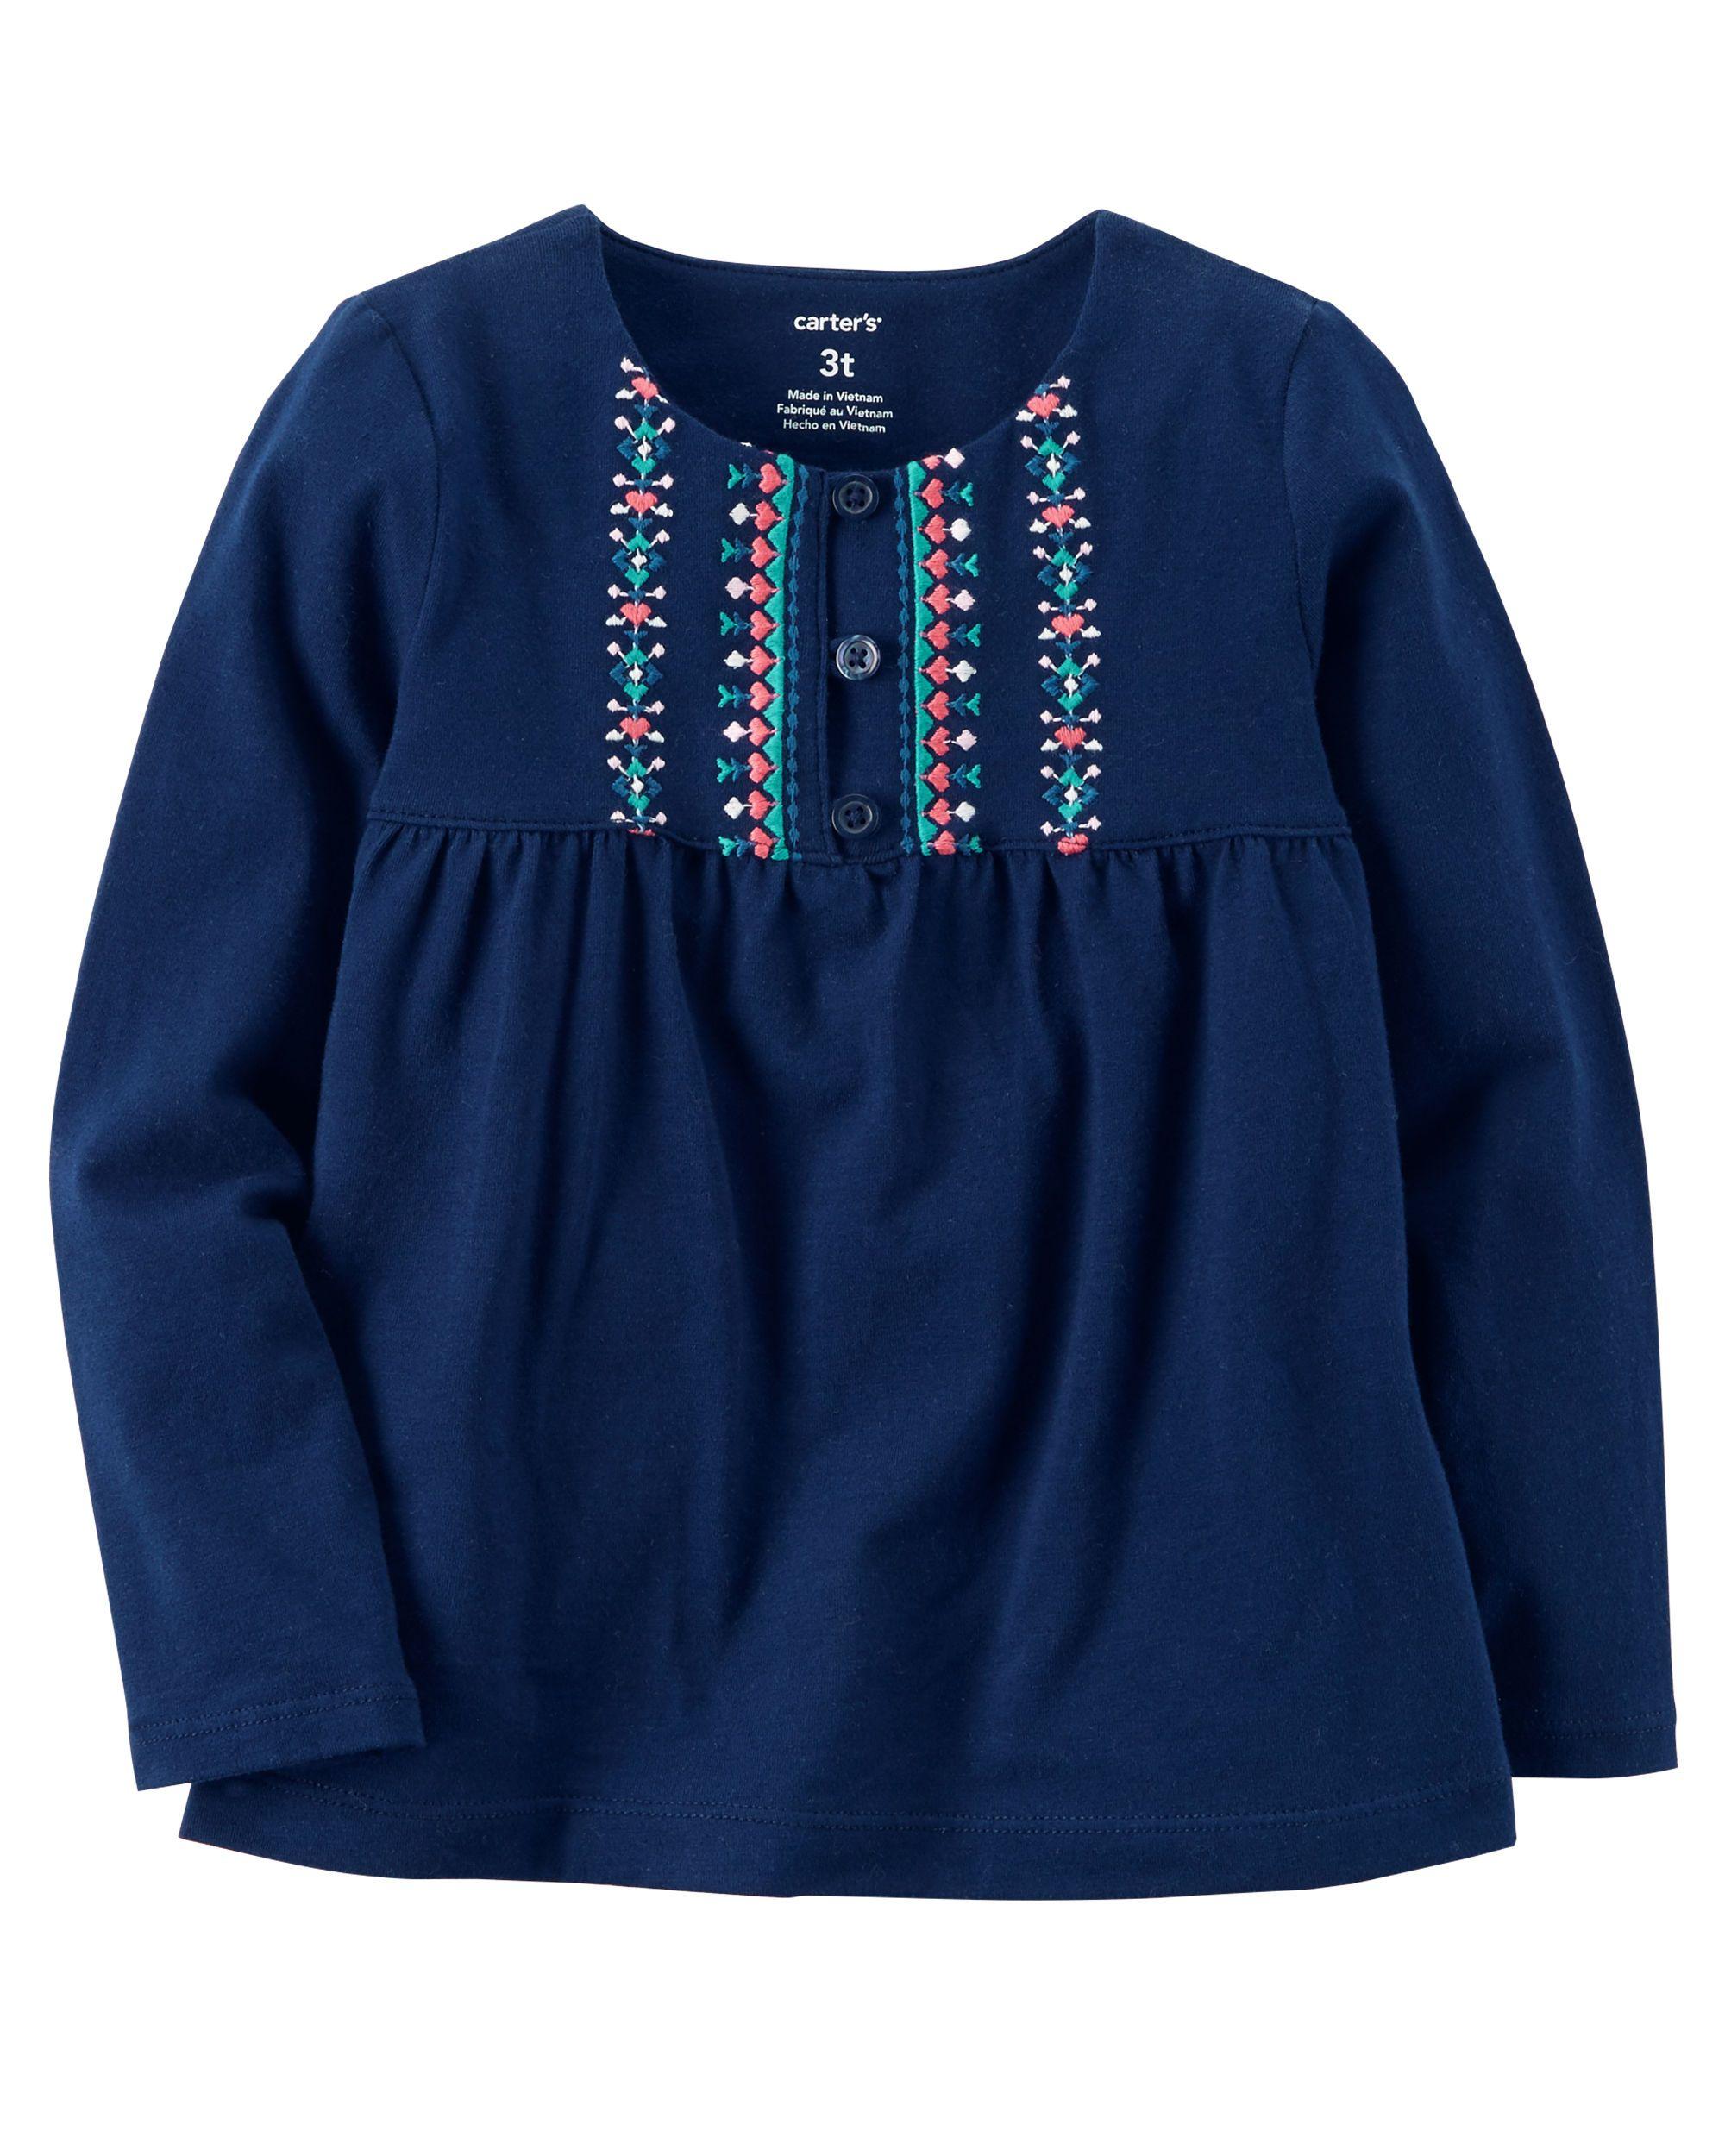 a89eba2f Embroidered Babydoll Top | Baby Girl | Niños, Bebe, Túnicas